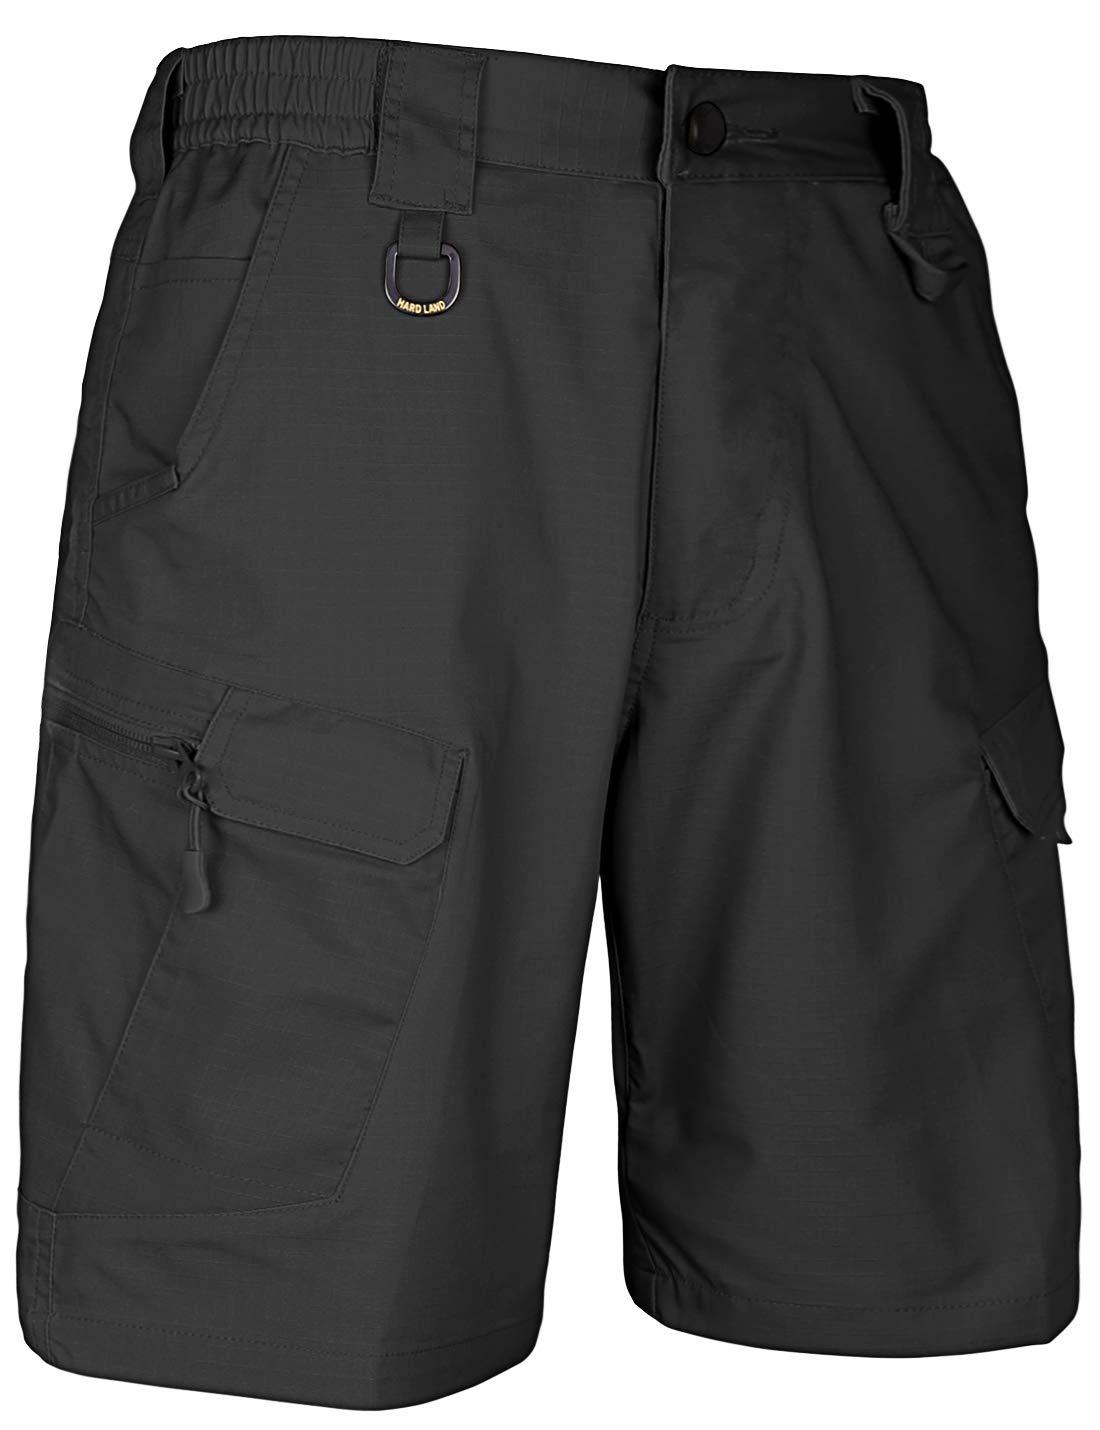 HARD LAND Men's 9.5'' Urban Tactical Shorts Waterproof Ripstop Teflon Elastic Waist Cargo Work Shorts Hiking Fishing Charcoal Waist38